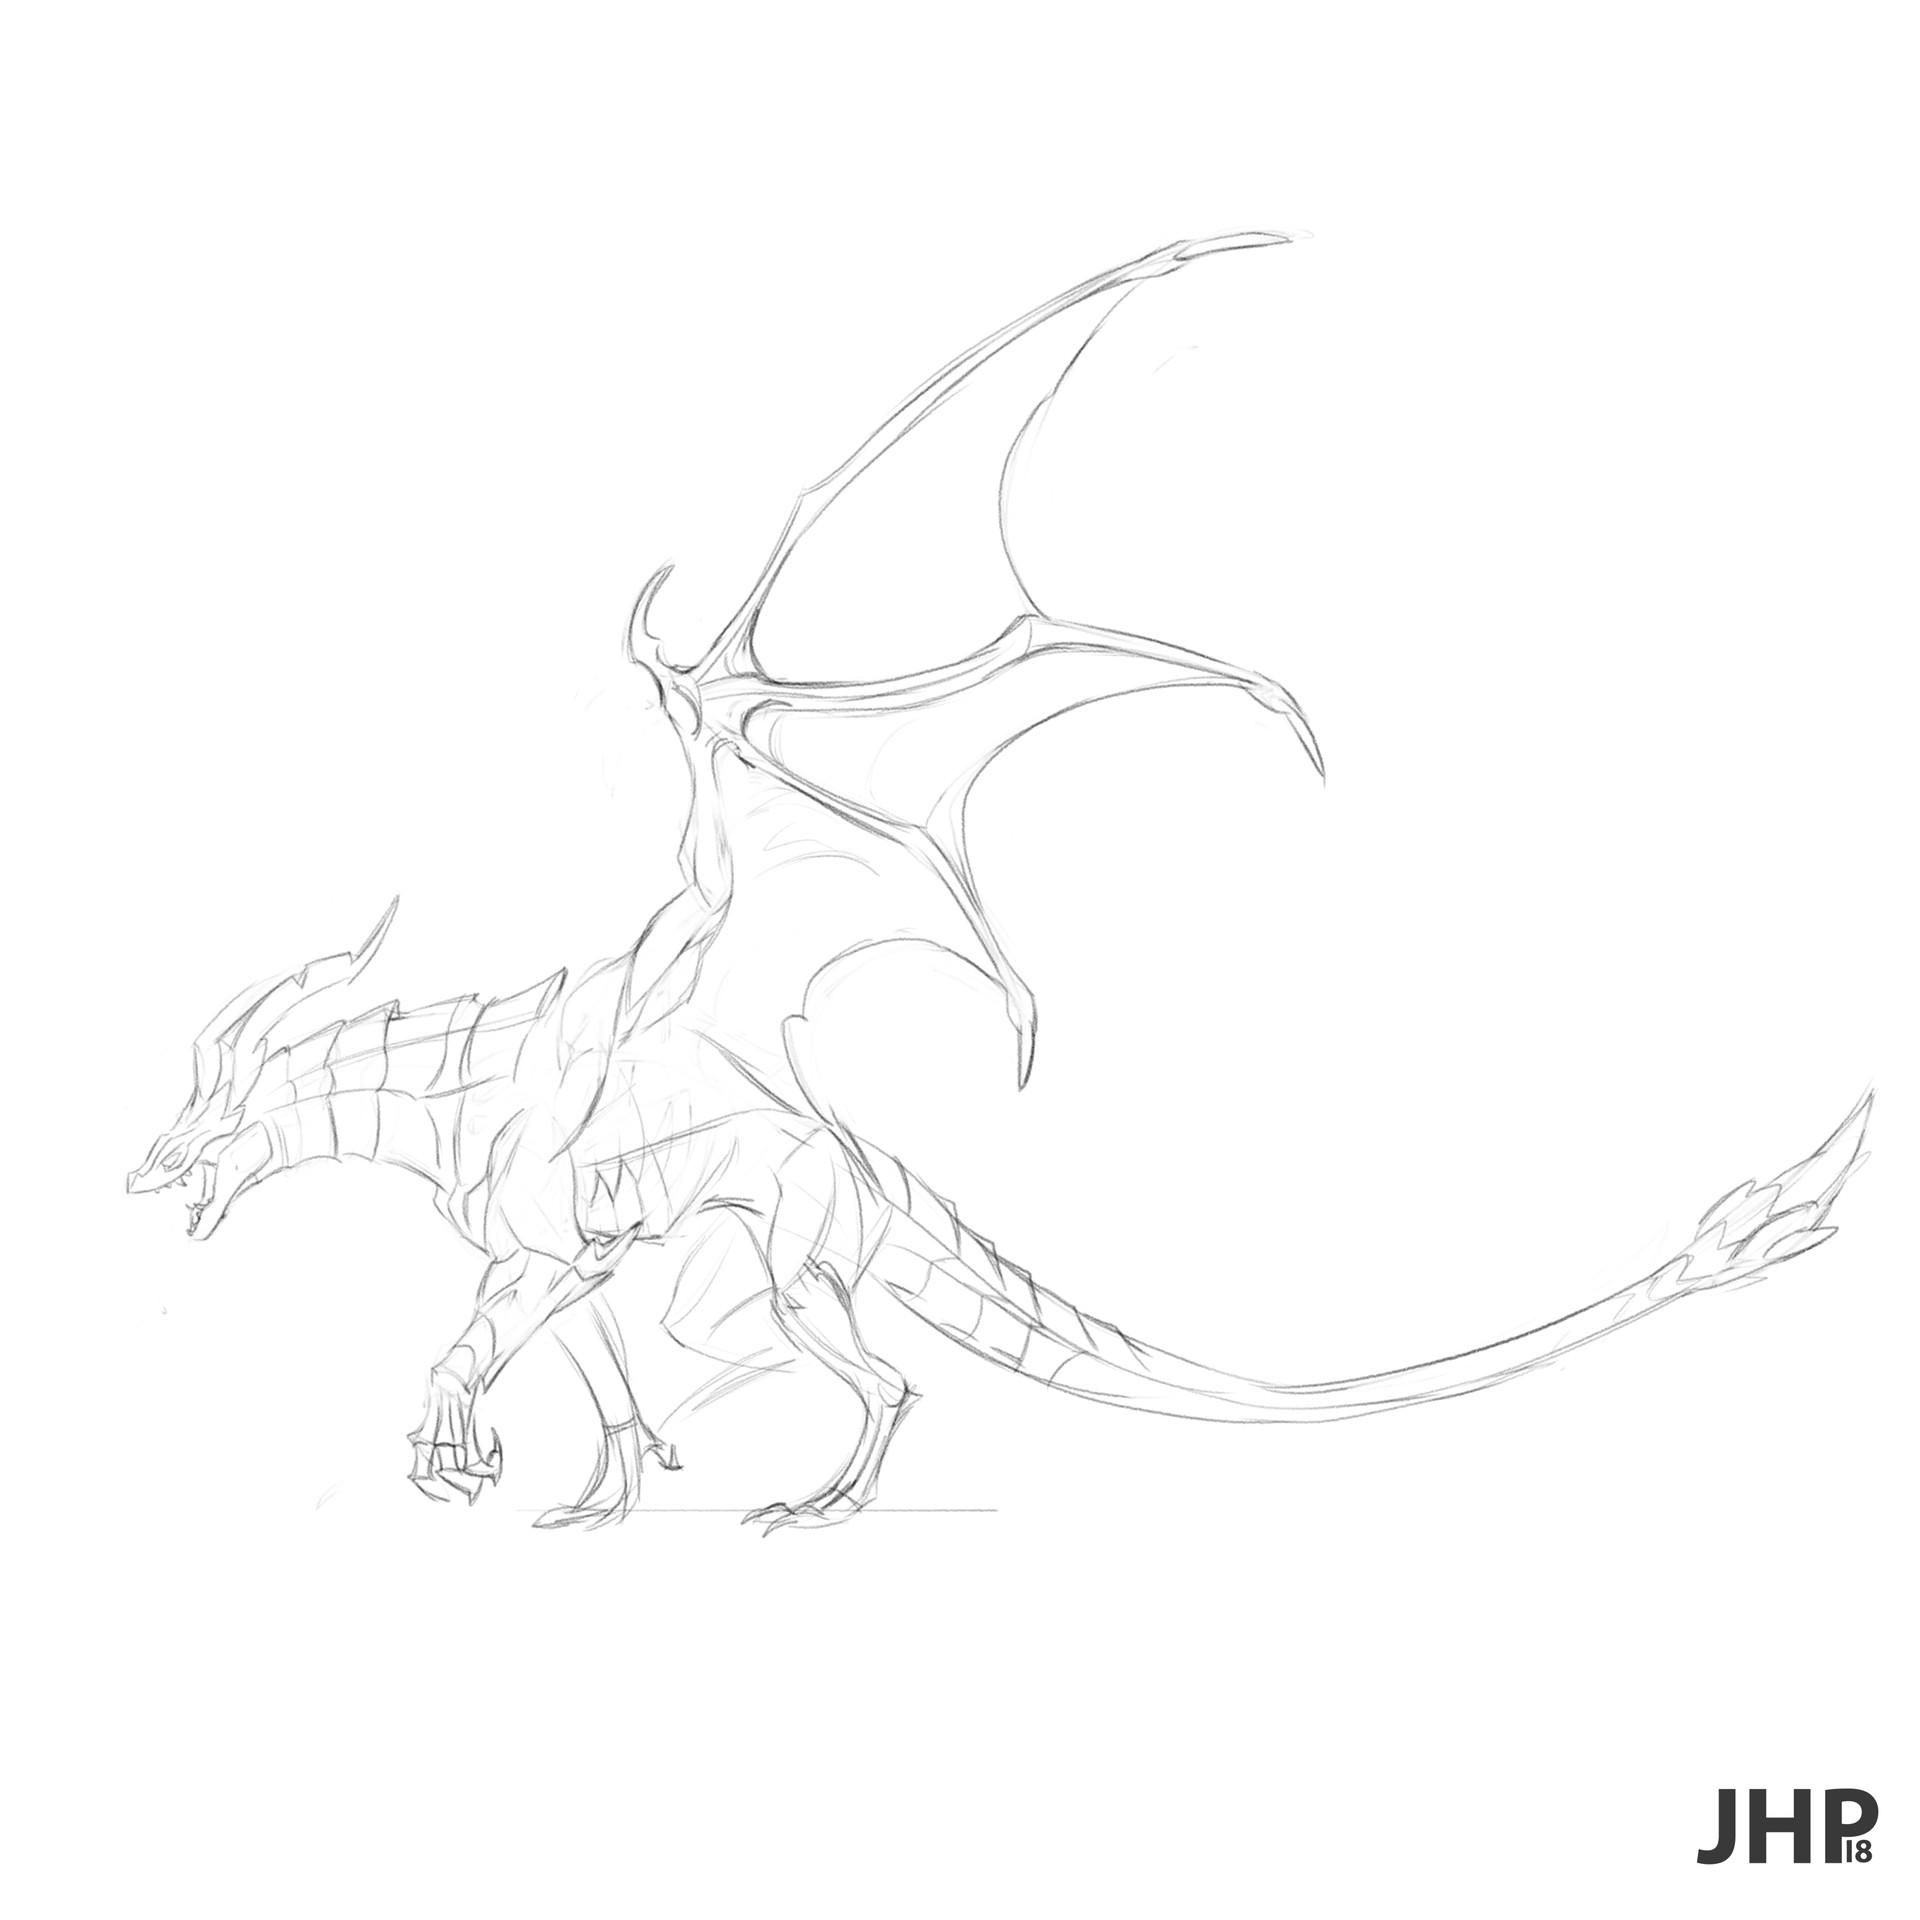 Joao henrique pacheco dragon p 1